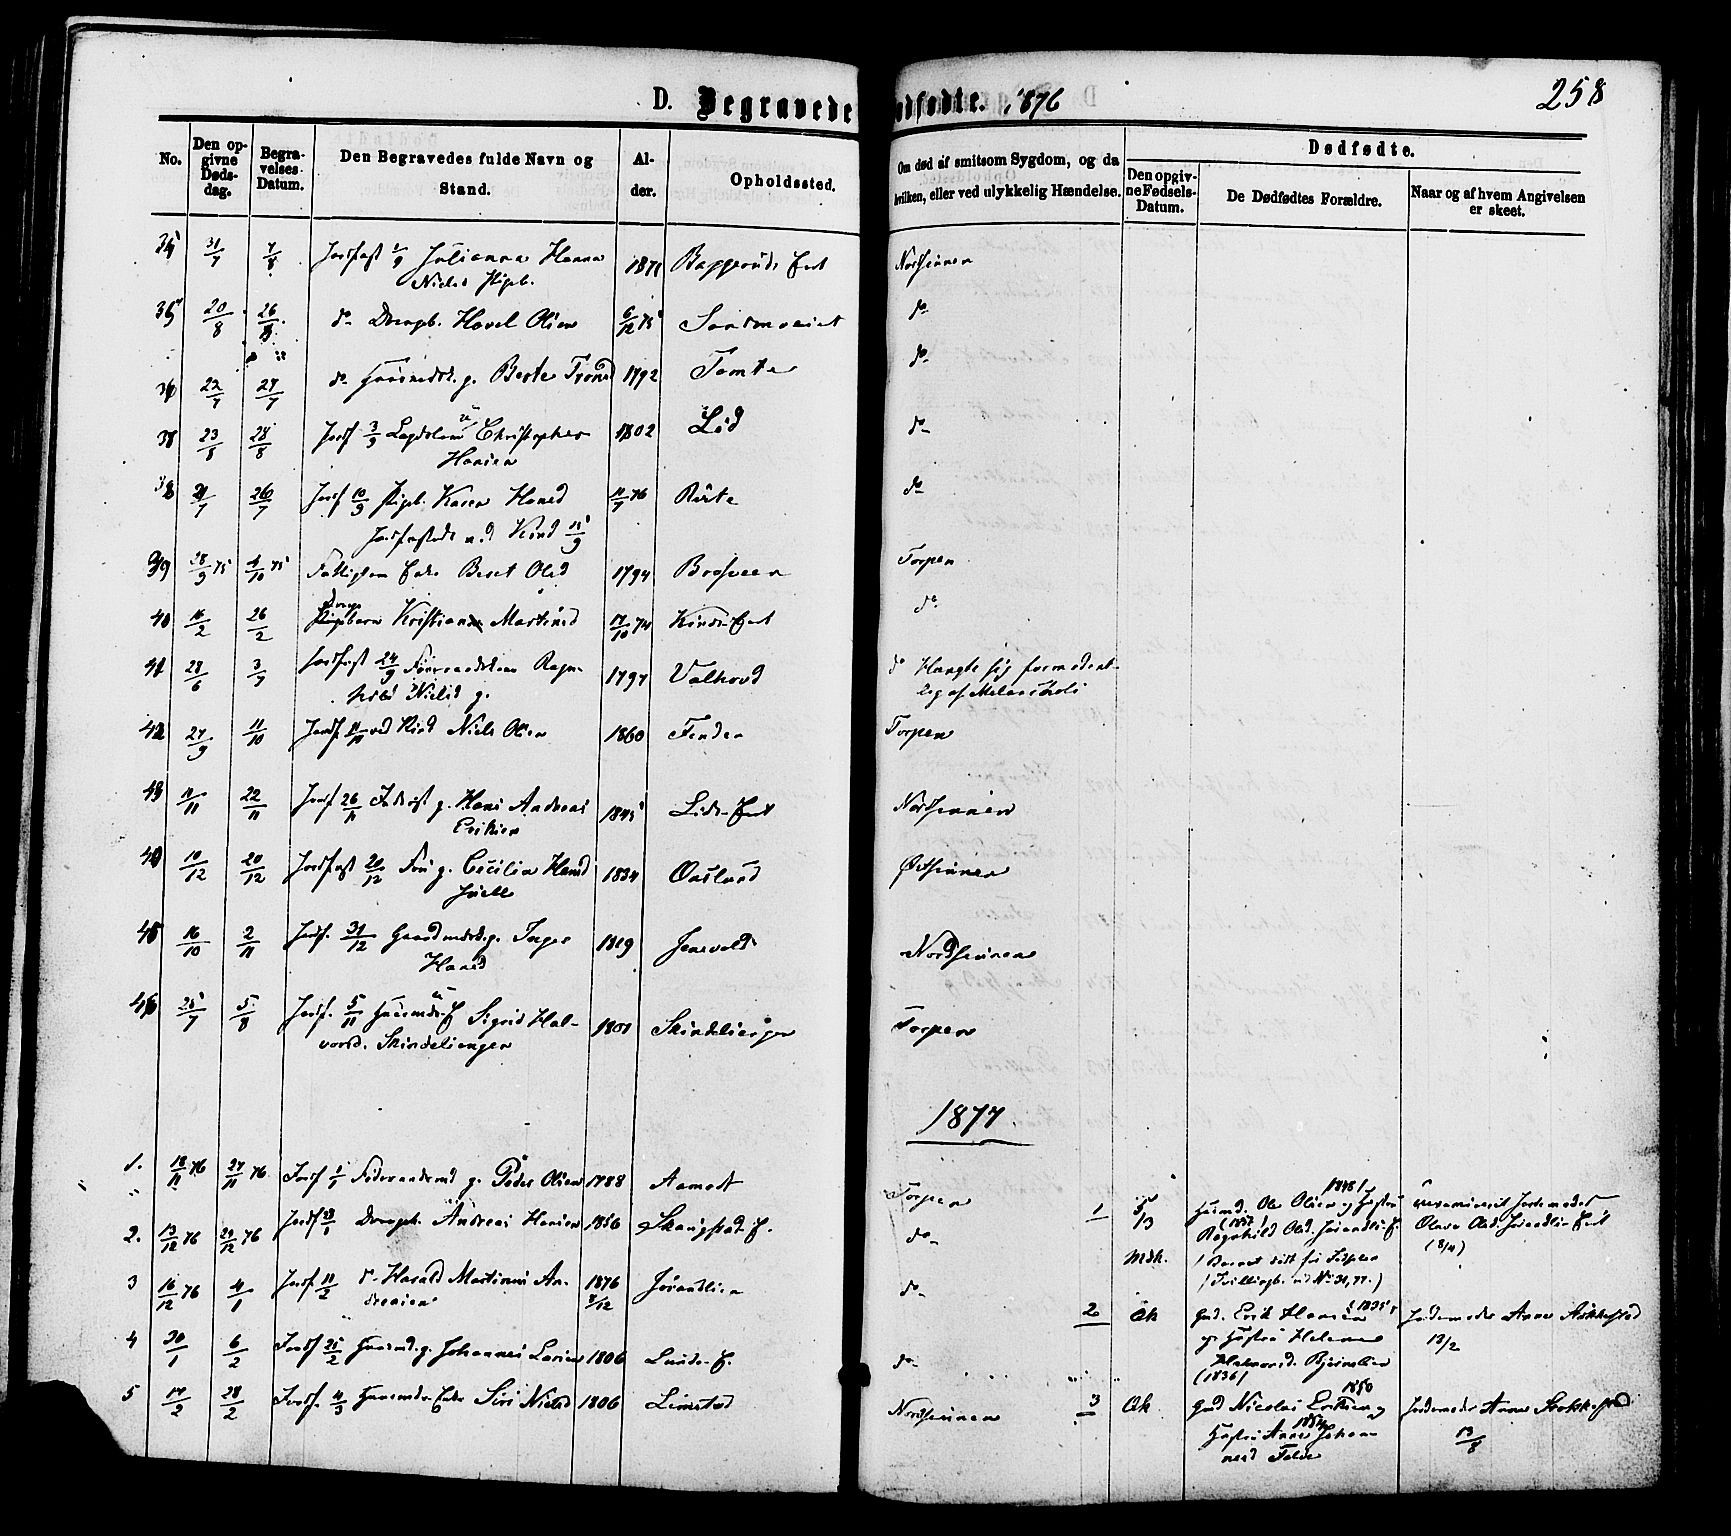 SAH, Nordre Land prestekontor, Ministerialbok nr. 2, 1872-1881, s. 258